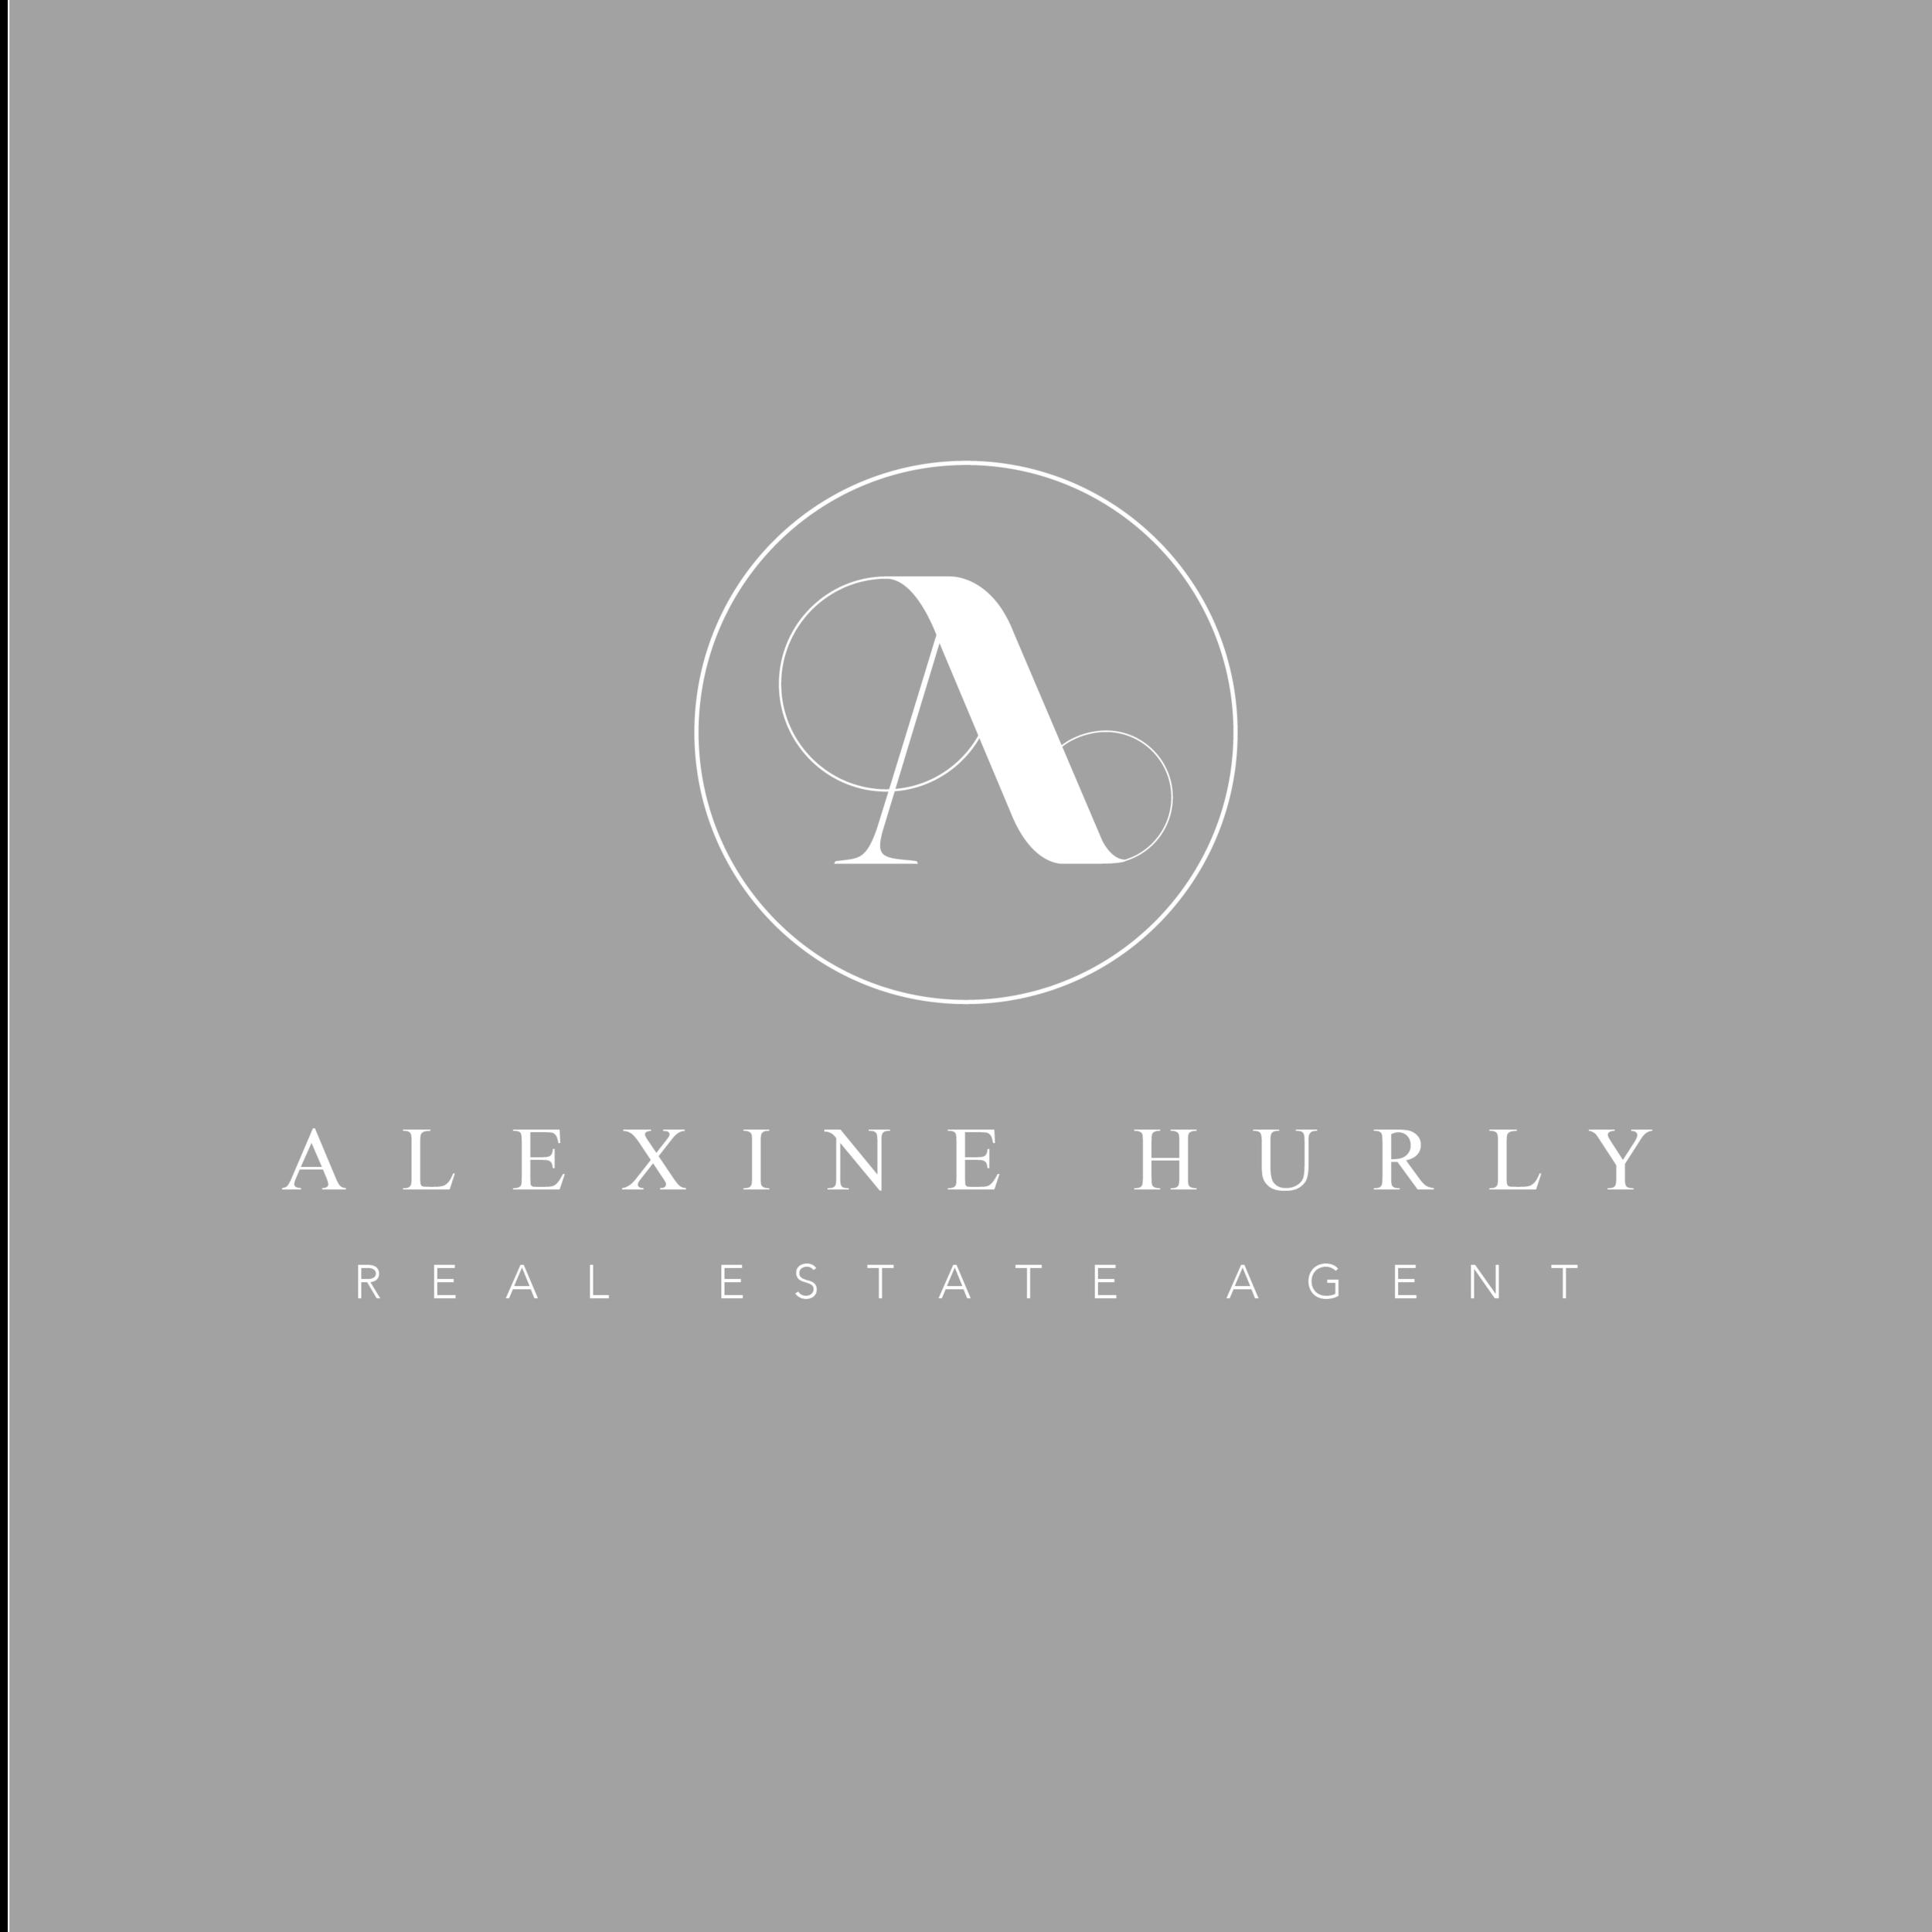 Alexine Full Logo.png